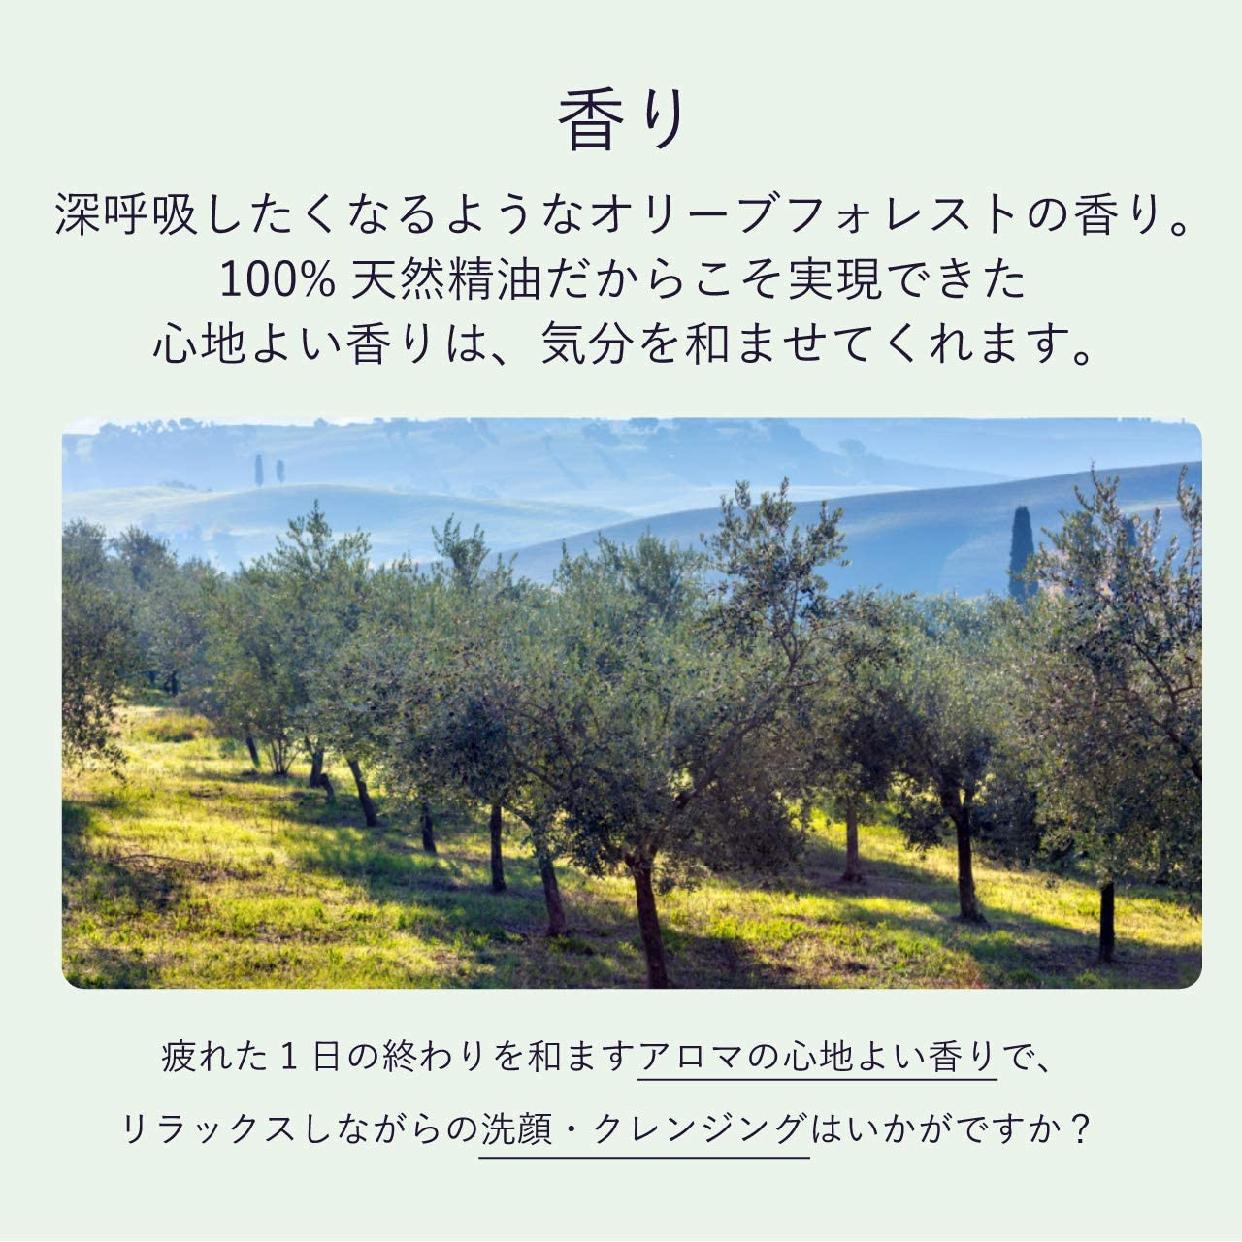 naive BOTANICAL(ナイーブボタニカル) クレンジングオイルの商品画像7